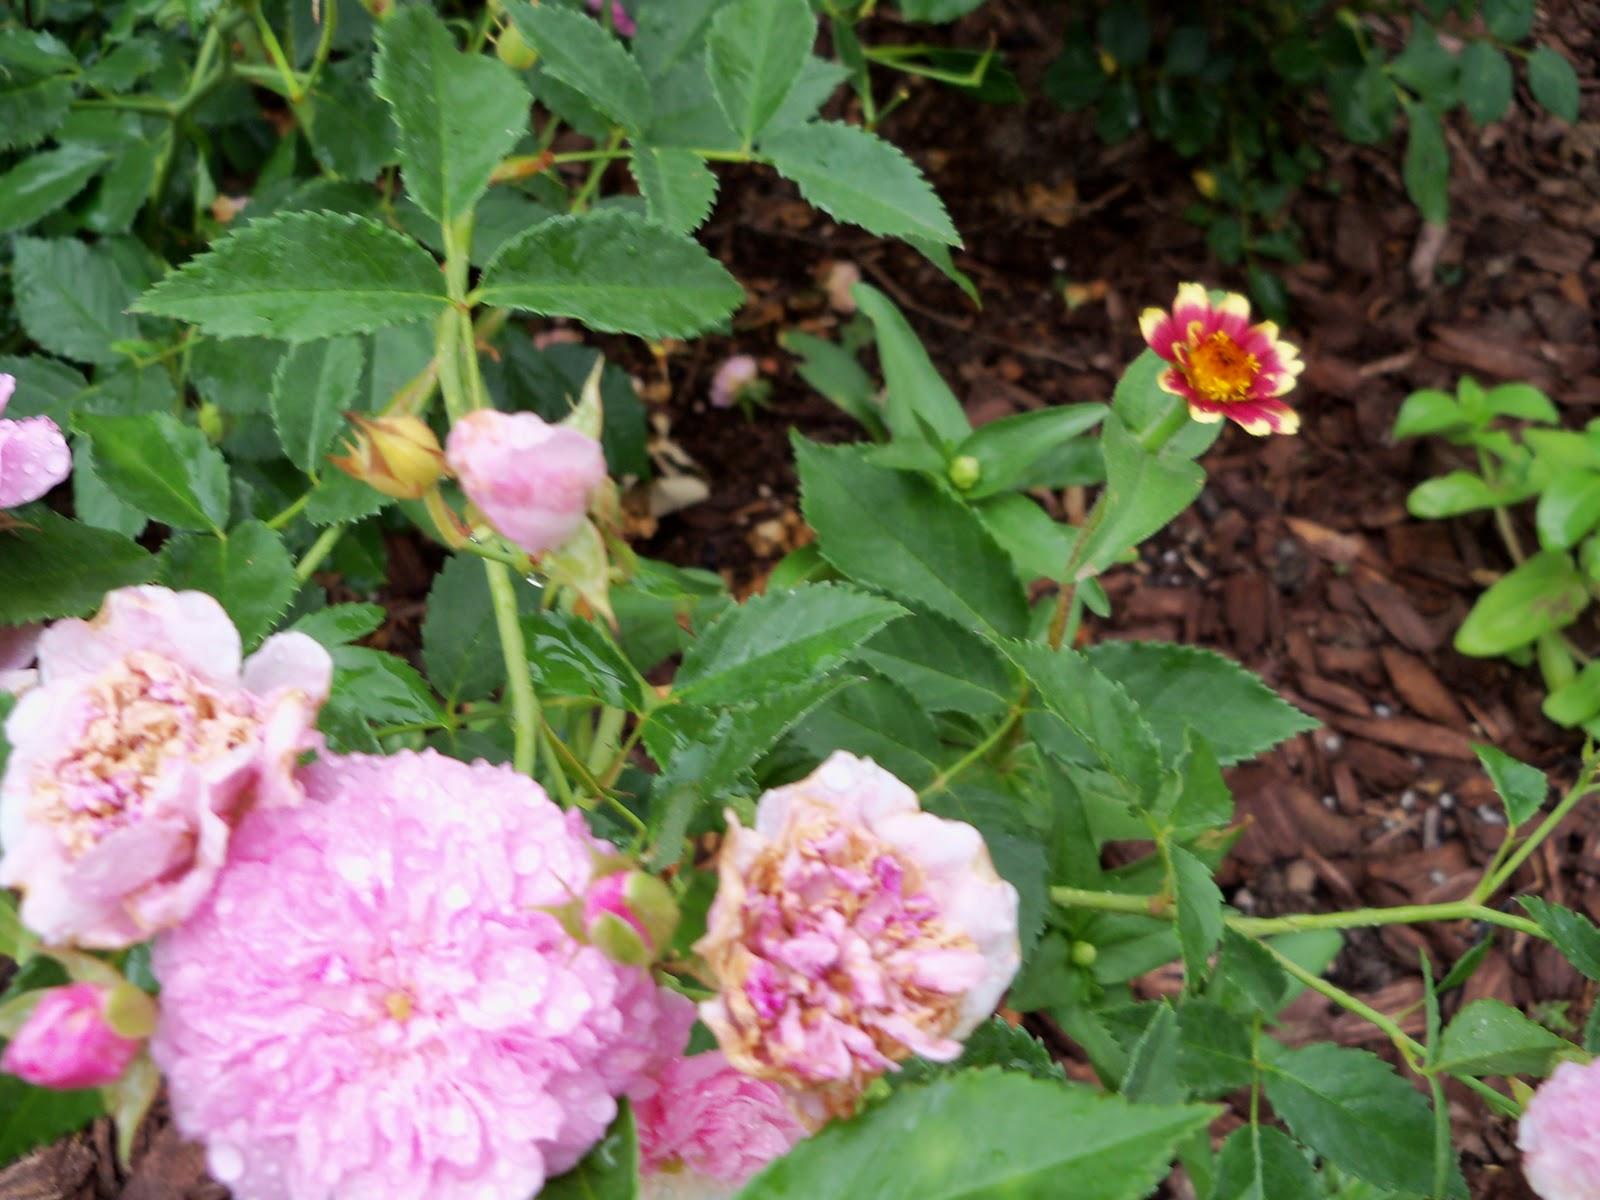 Gardening 2010, Part Two - 101_2119.JPG